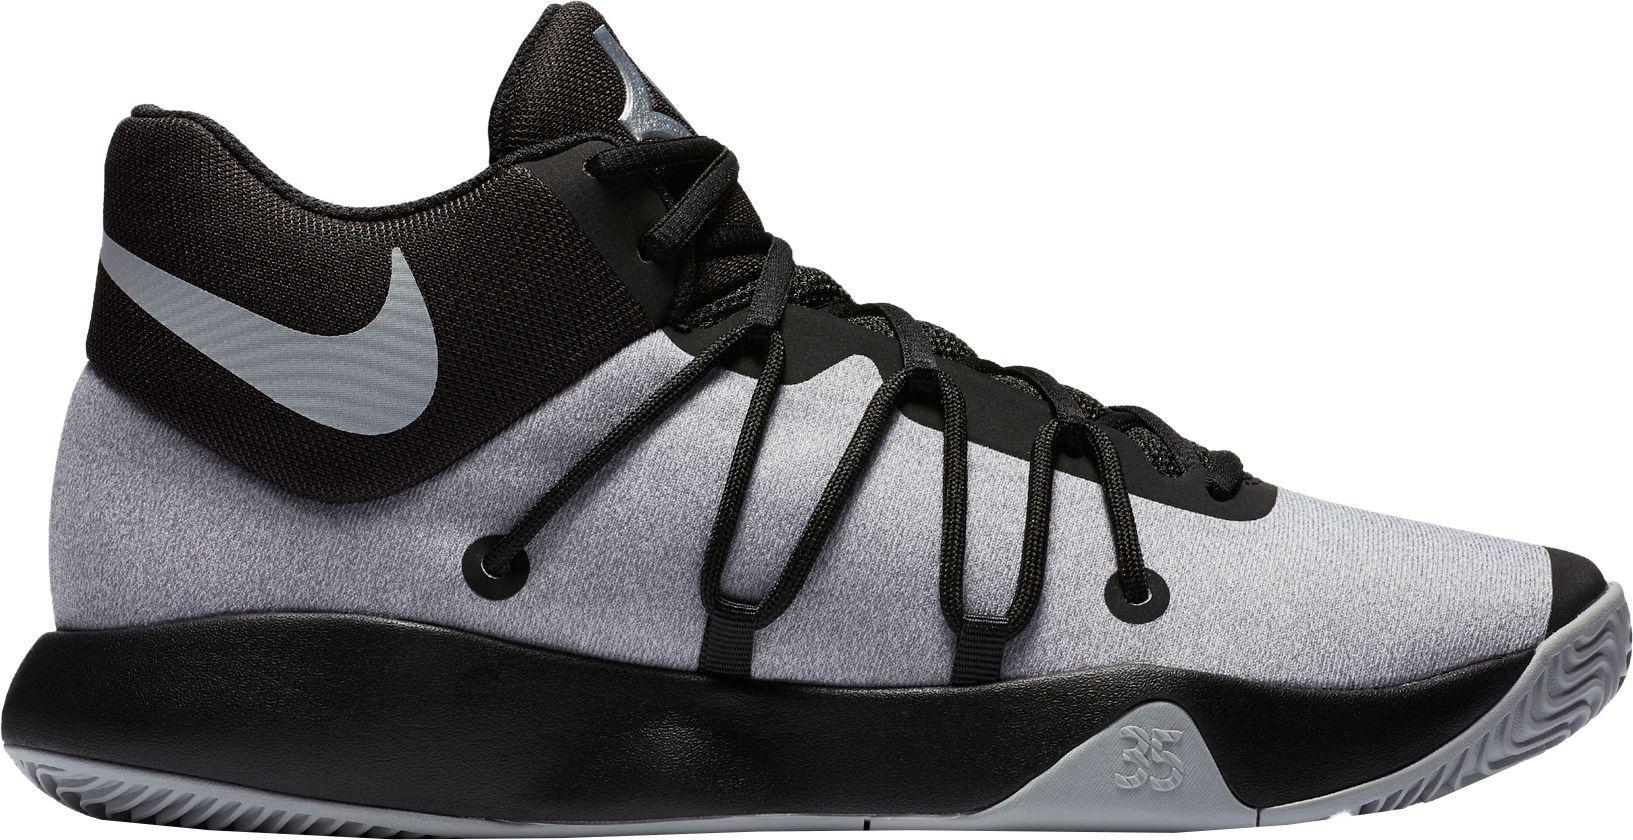 meet 88349 b51f6 Nike - Black Kd Trey 5 V Basketball Shoes for Men - Lyst